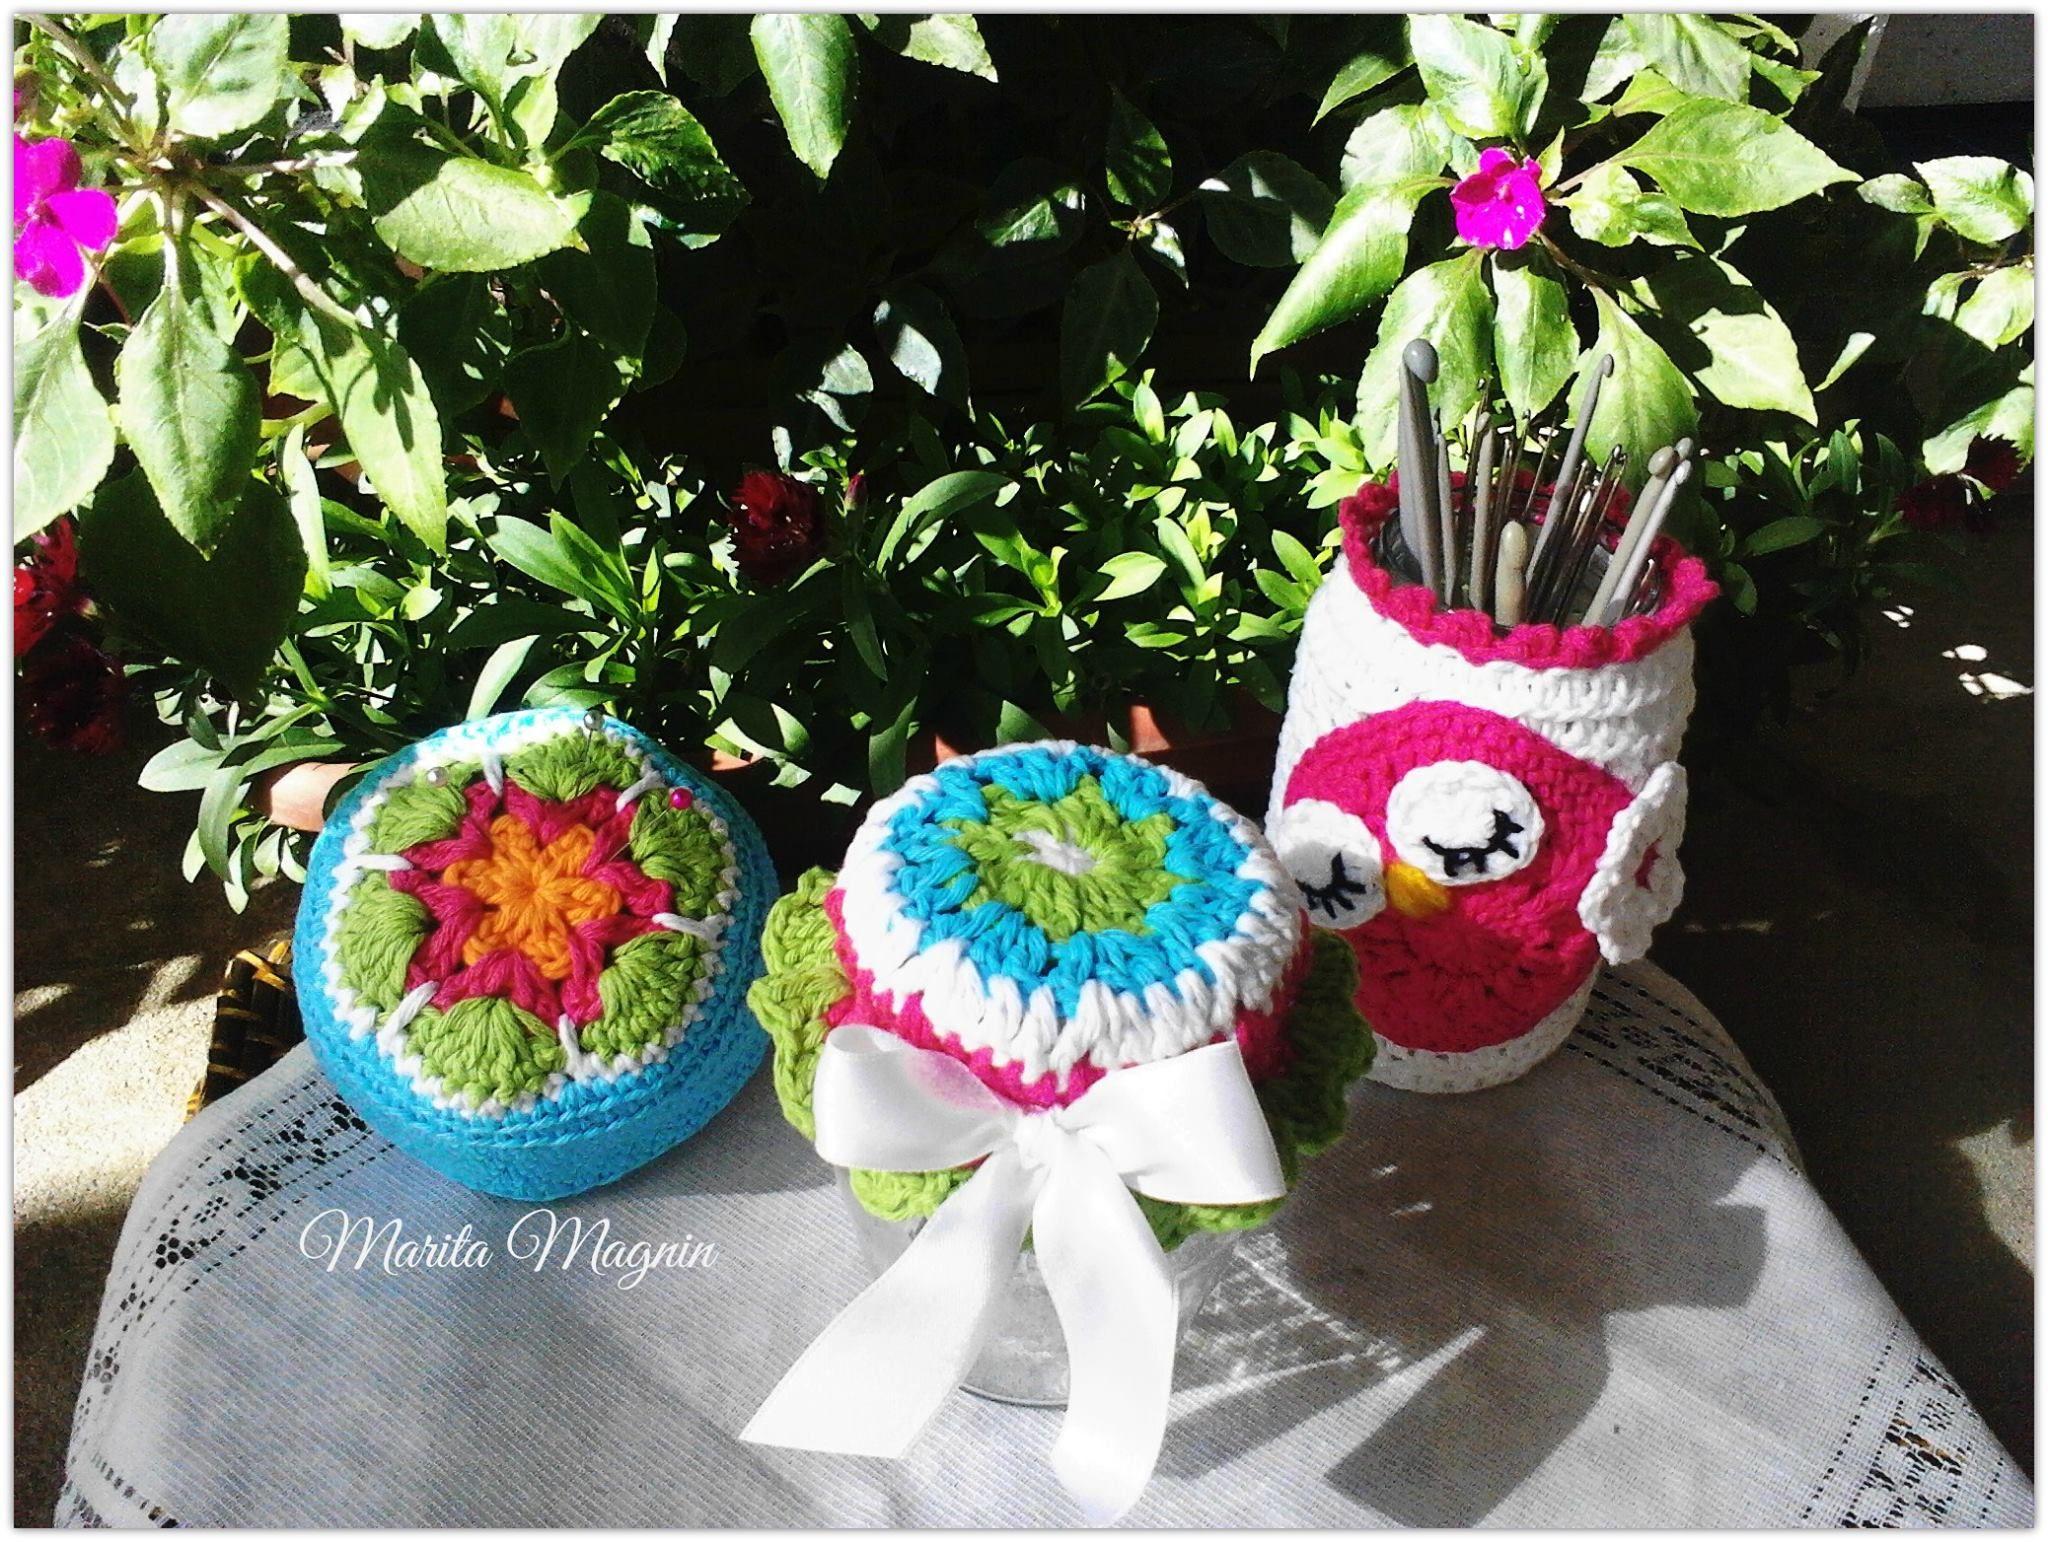 ●✿●Tapas o cubre frascos a crochet y alfiletero flor africana●✿●